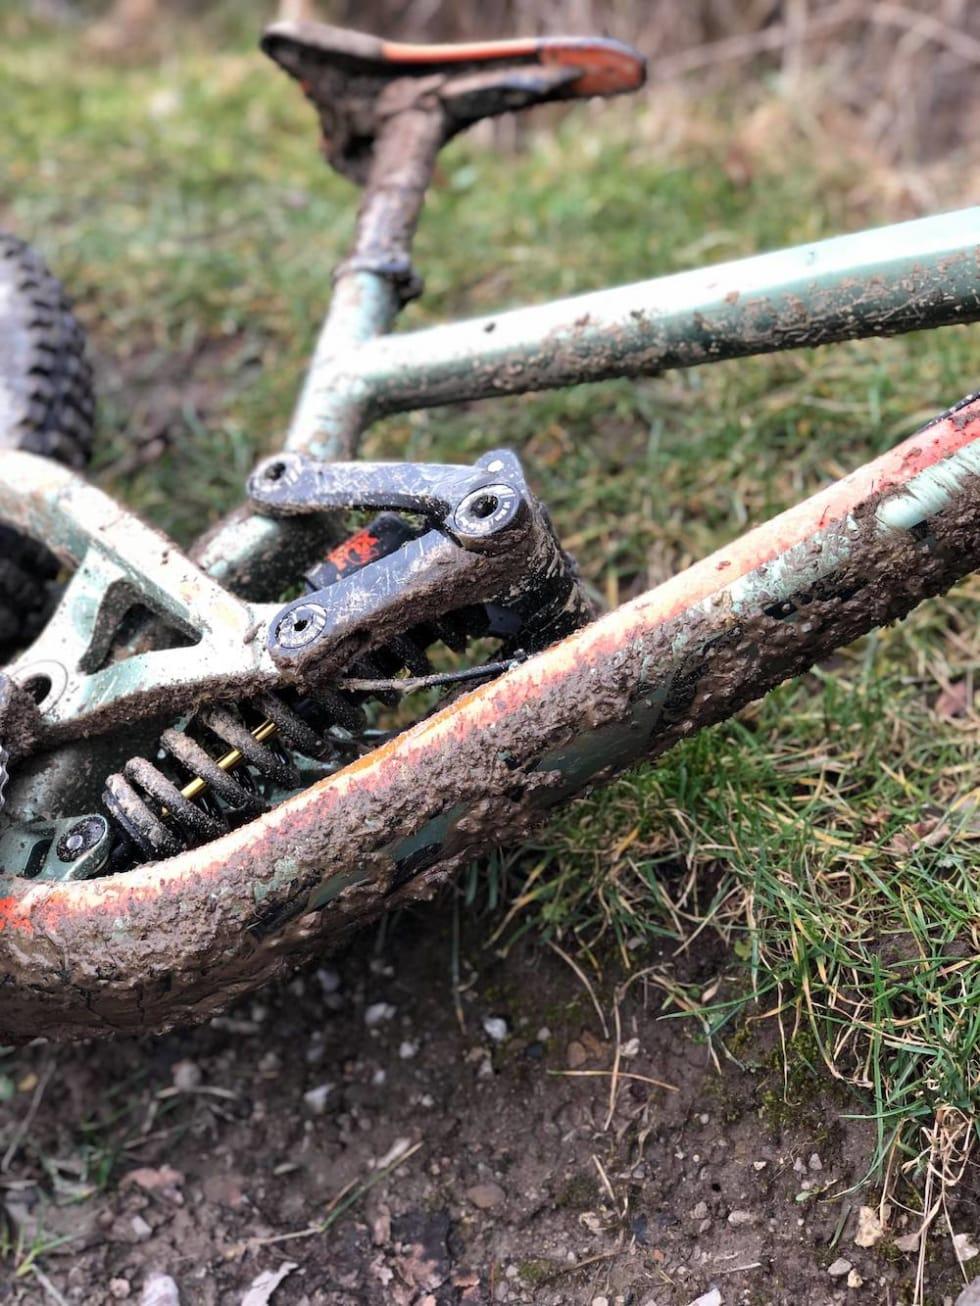 Wales mud 2019 - Simen Smestad 1000x